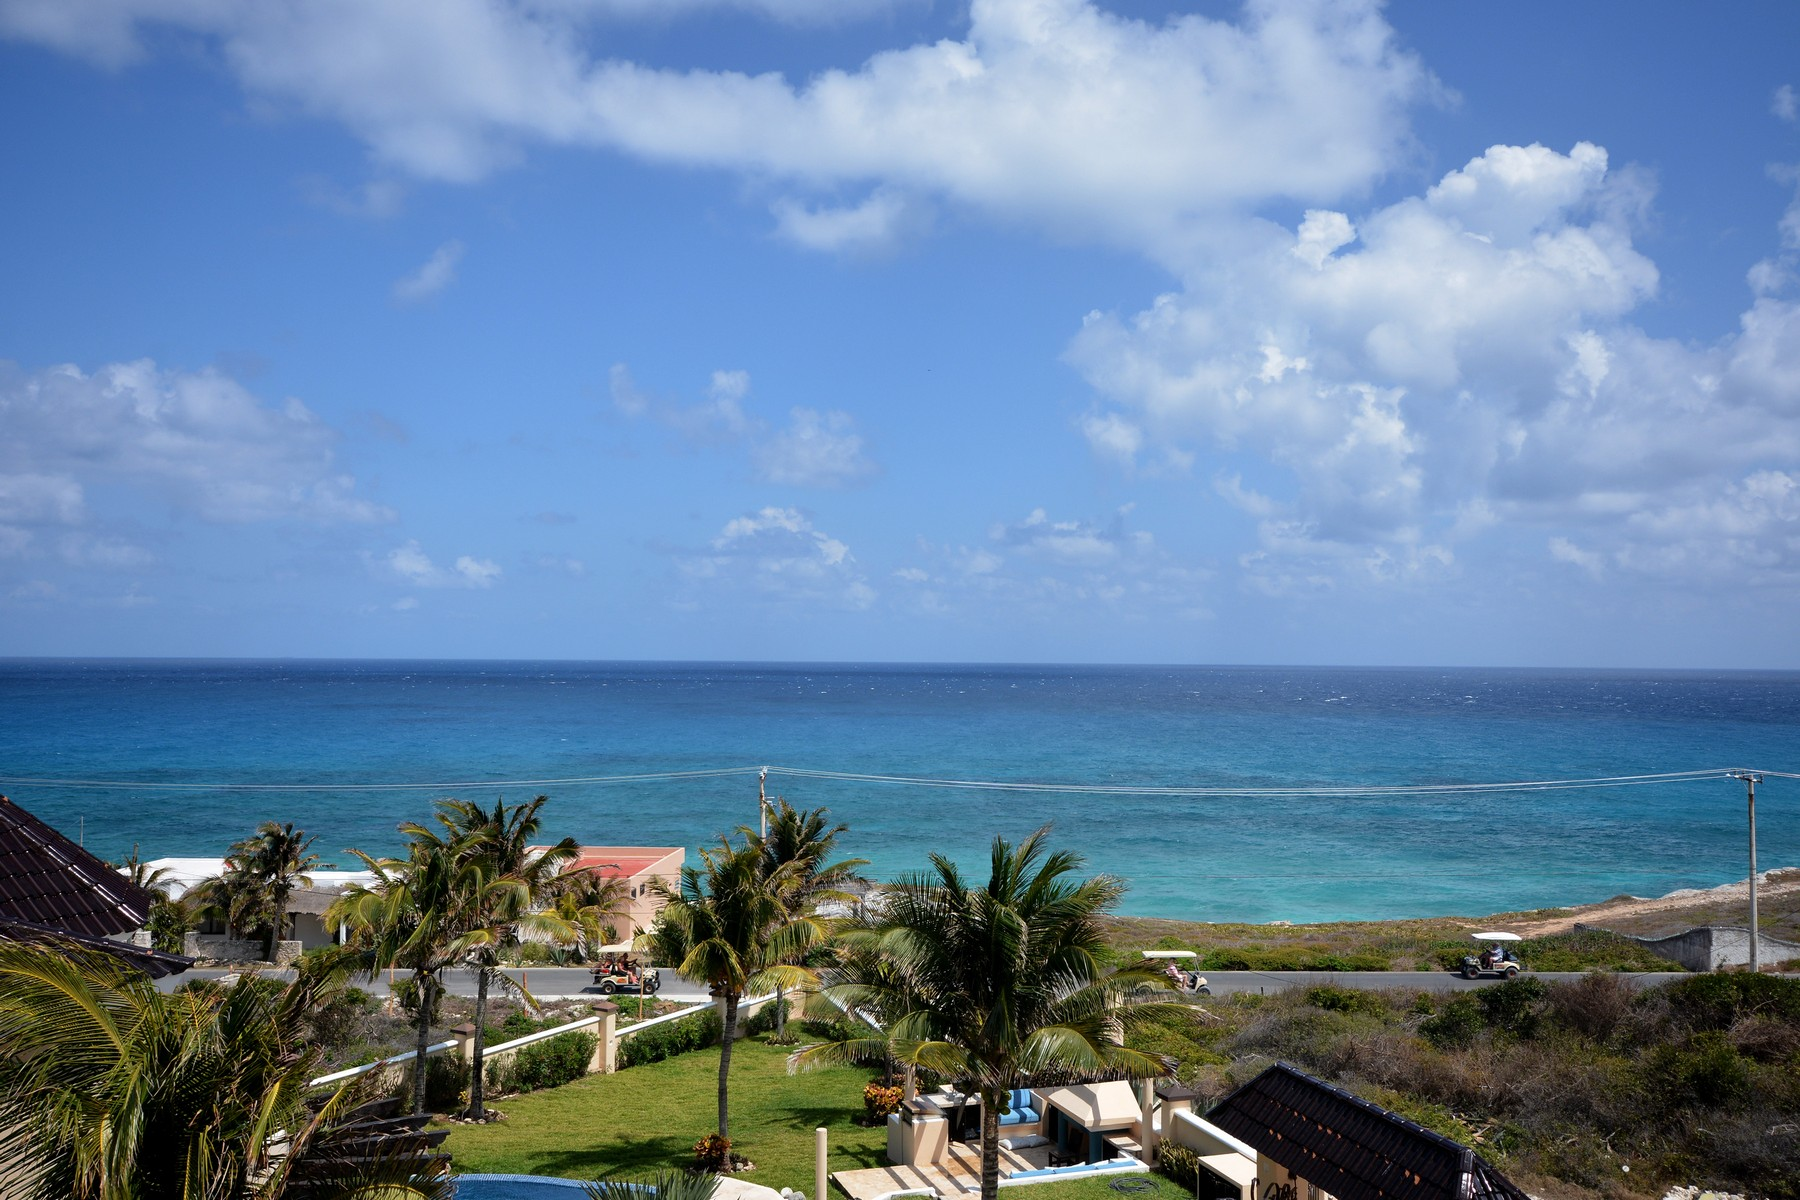 Single Family Home for Sale at CASA ELIZABETH: CARIBBEAN ISLAND LIVING Isla Mujeres, Mexico